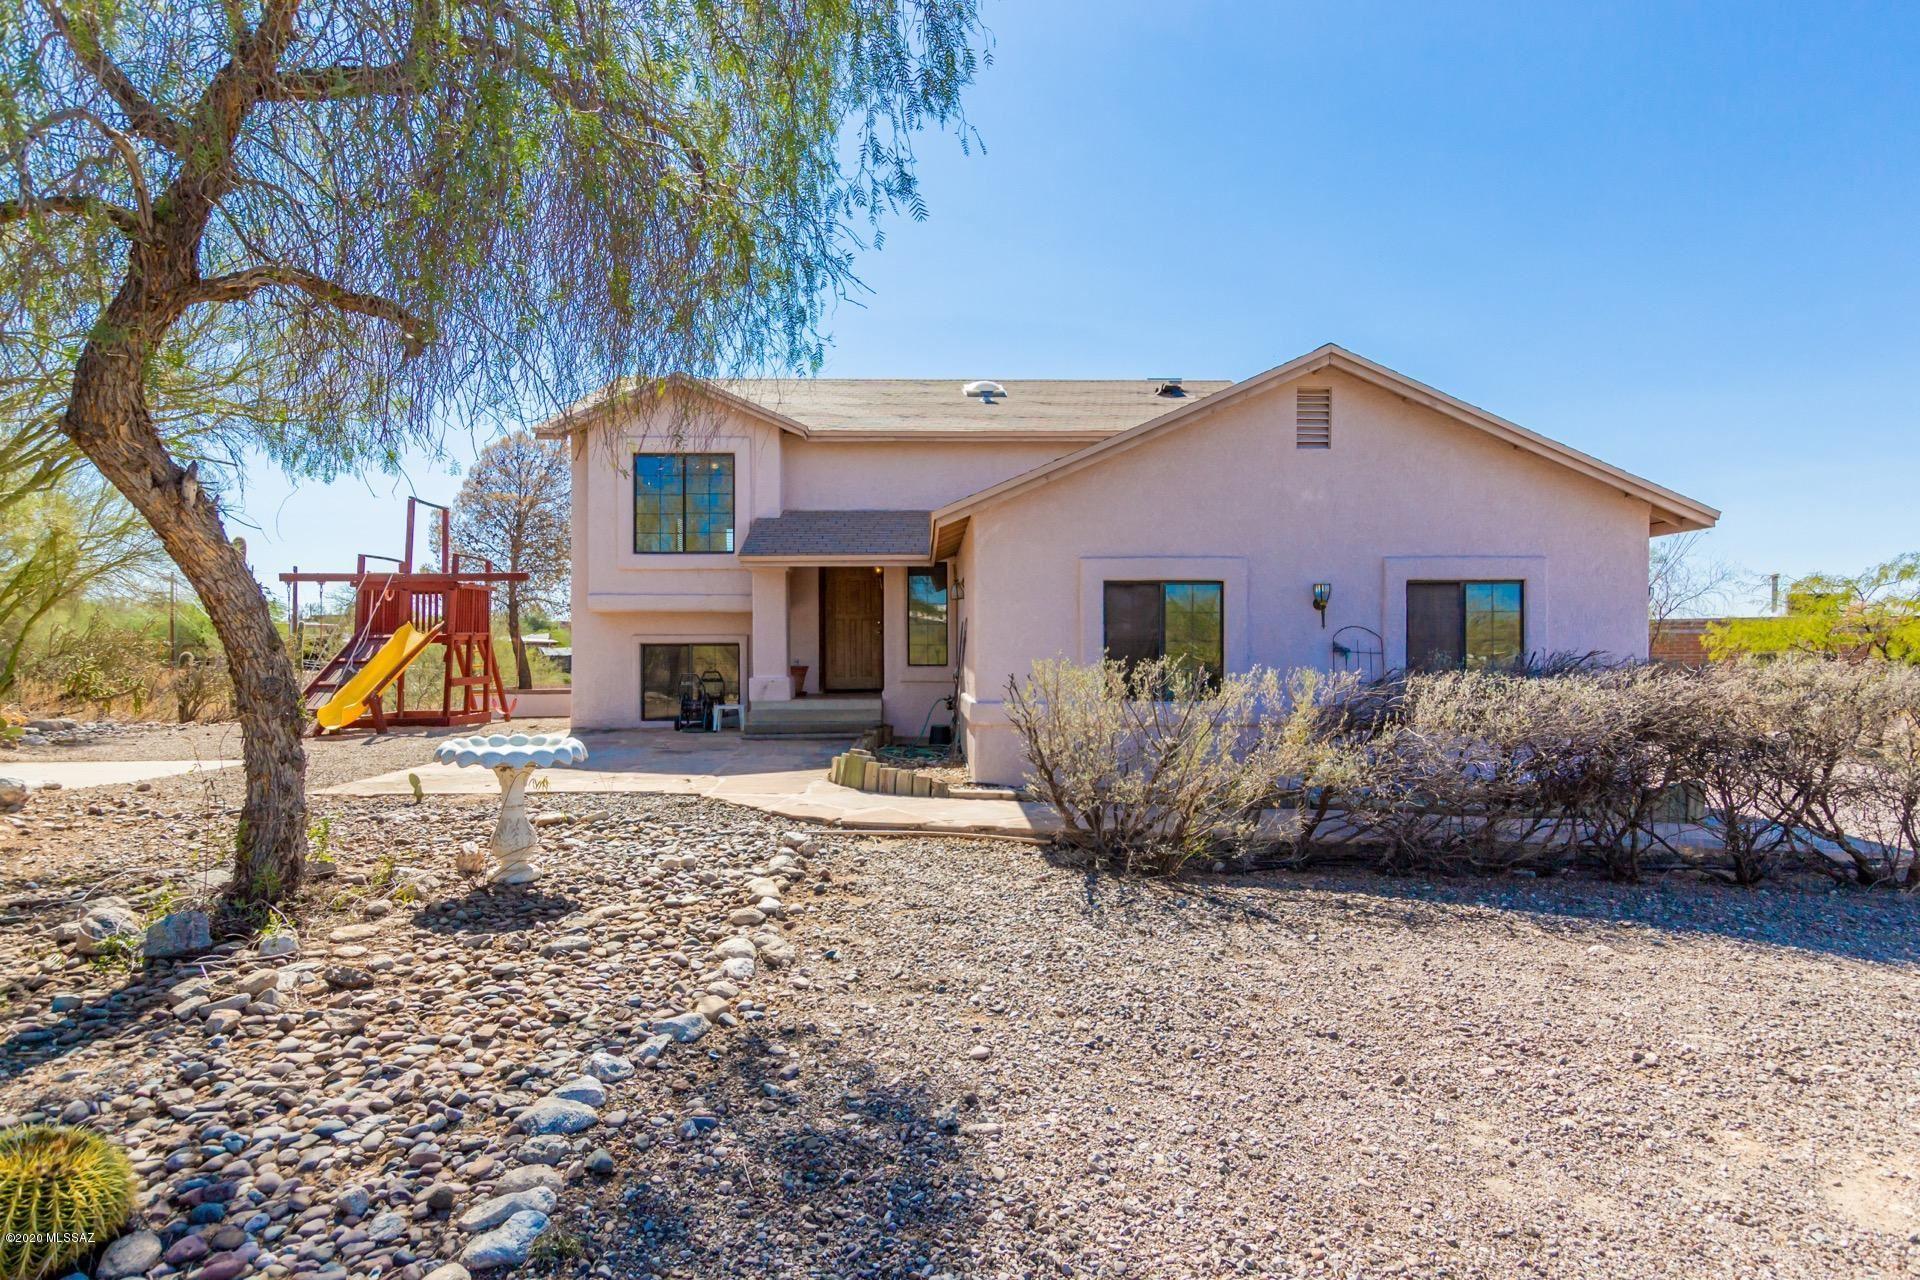 414 E Suffolk Drive, Tucson, AZ 85704 - MLS#: 22030363